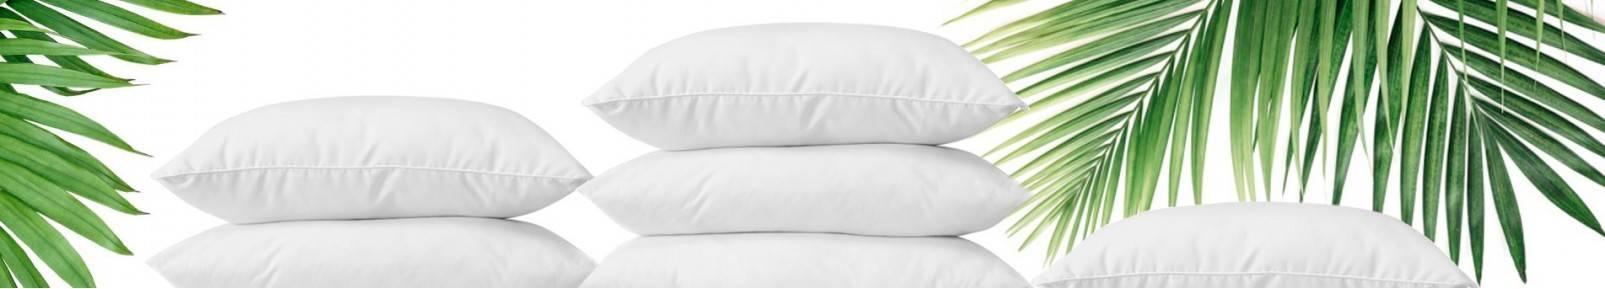 Almohadas para Cervicales [Fabricantes]